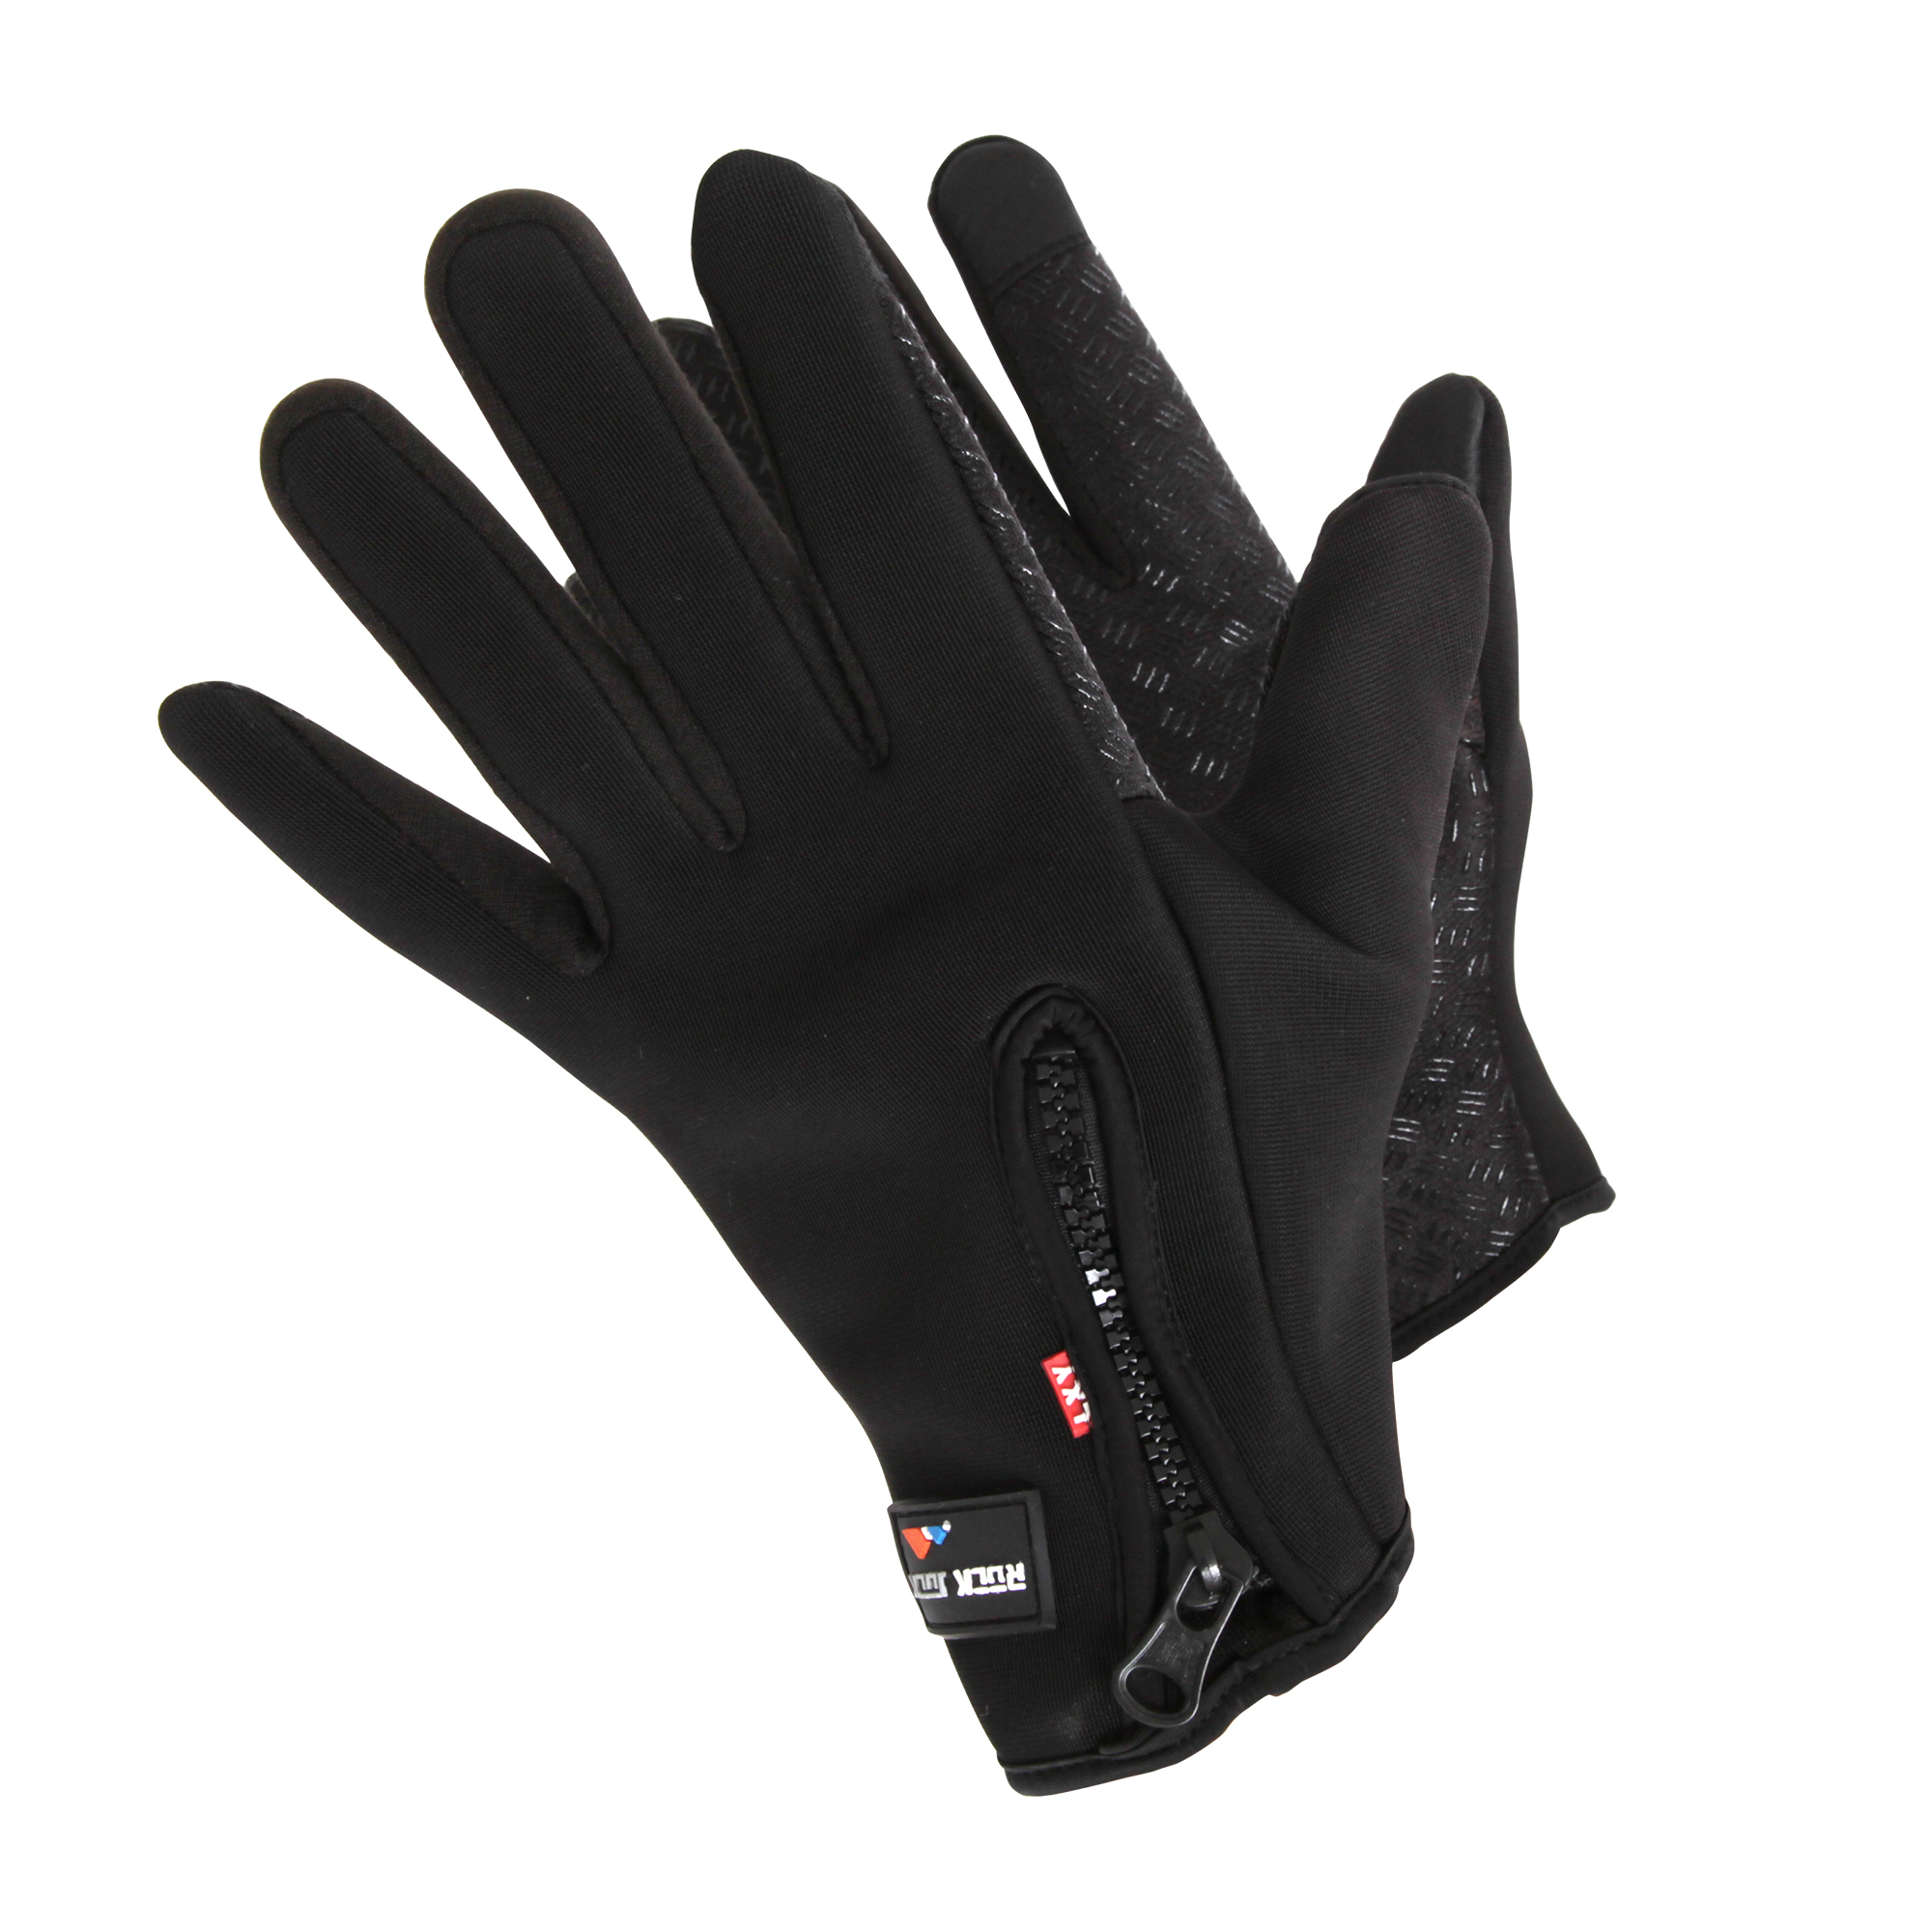 rockjock damen thermo handschuhe mit griffiger handfl che. Black Bedroom Furniture Sets. Home Design Ideas